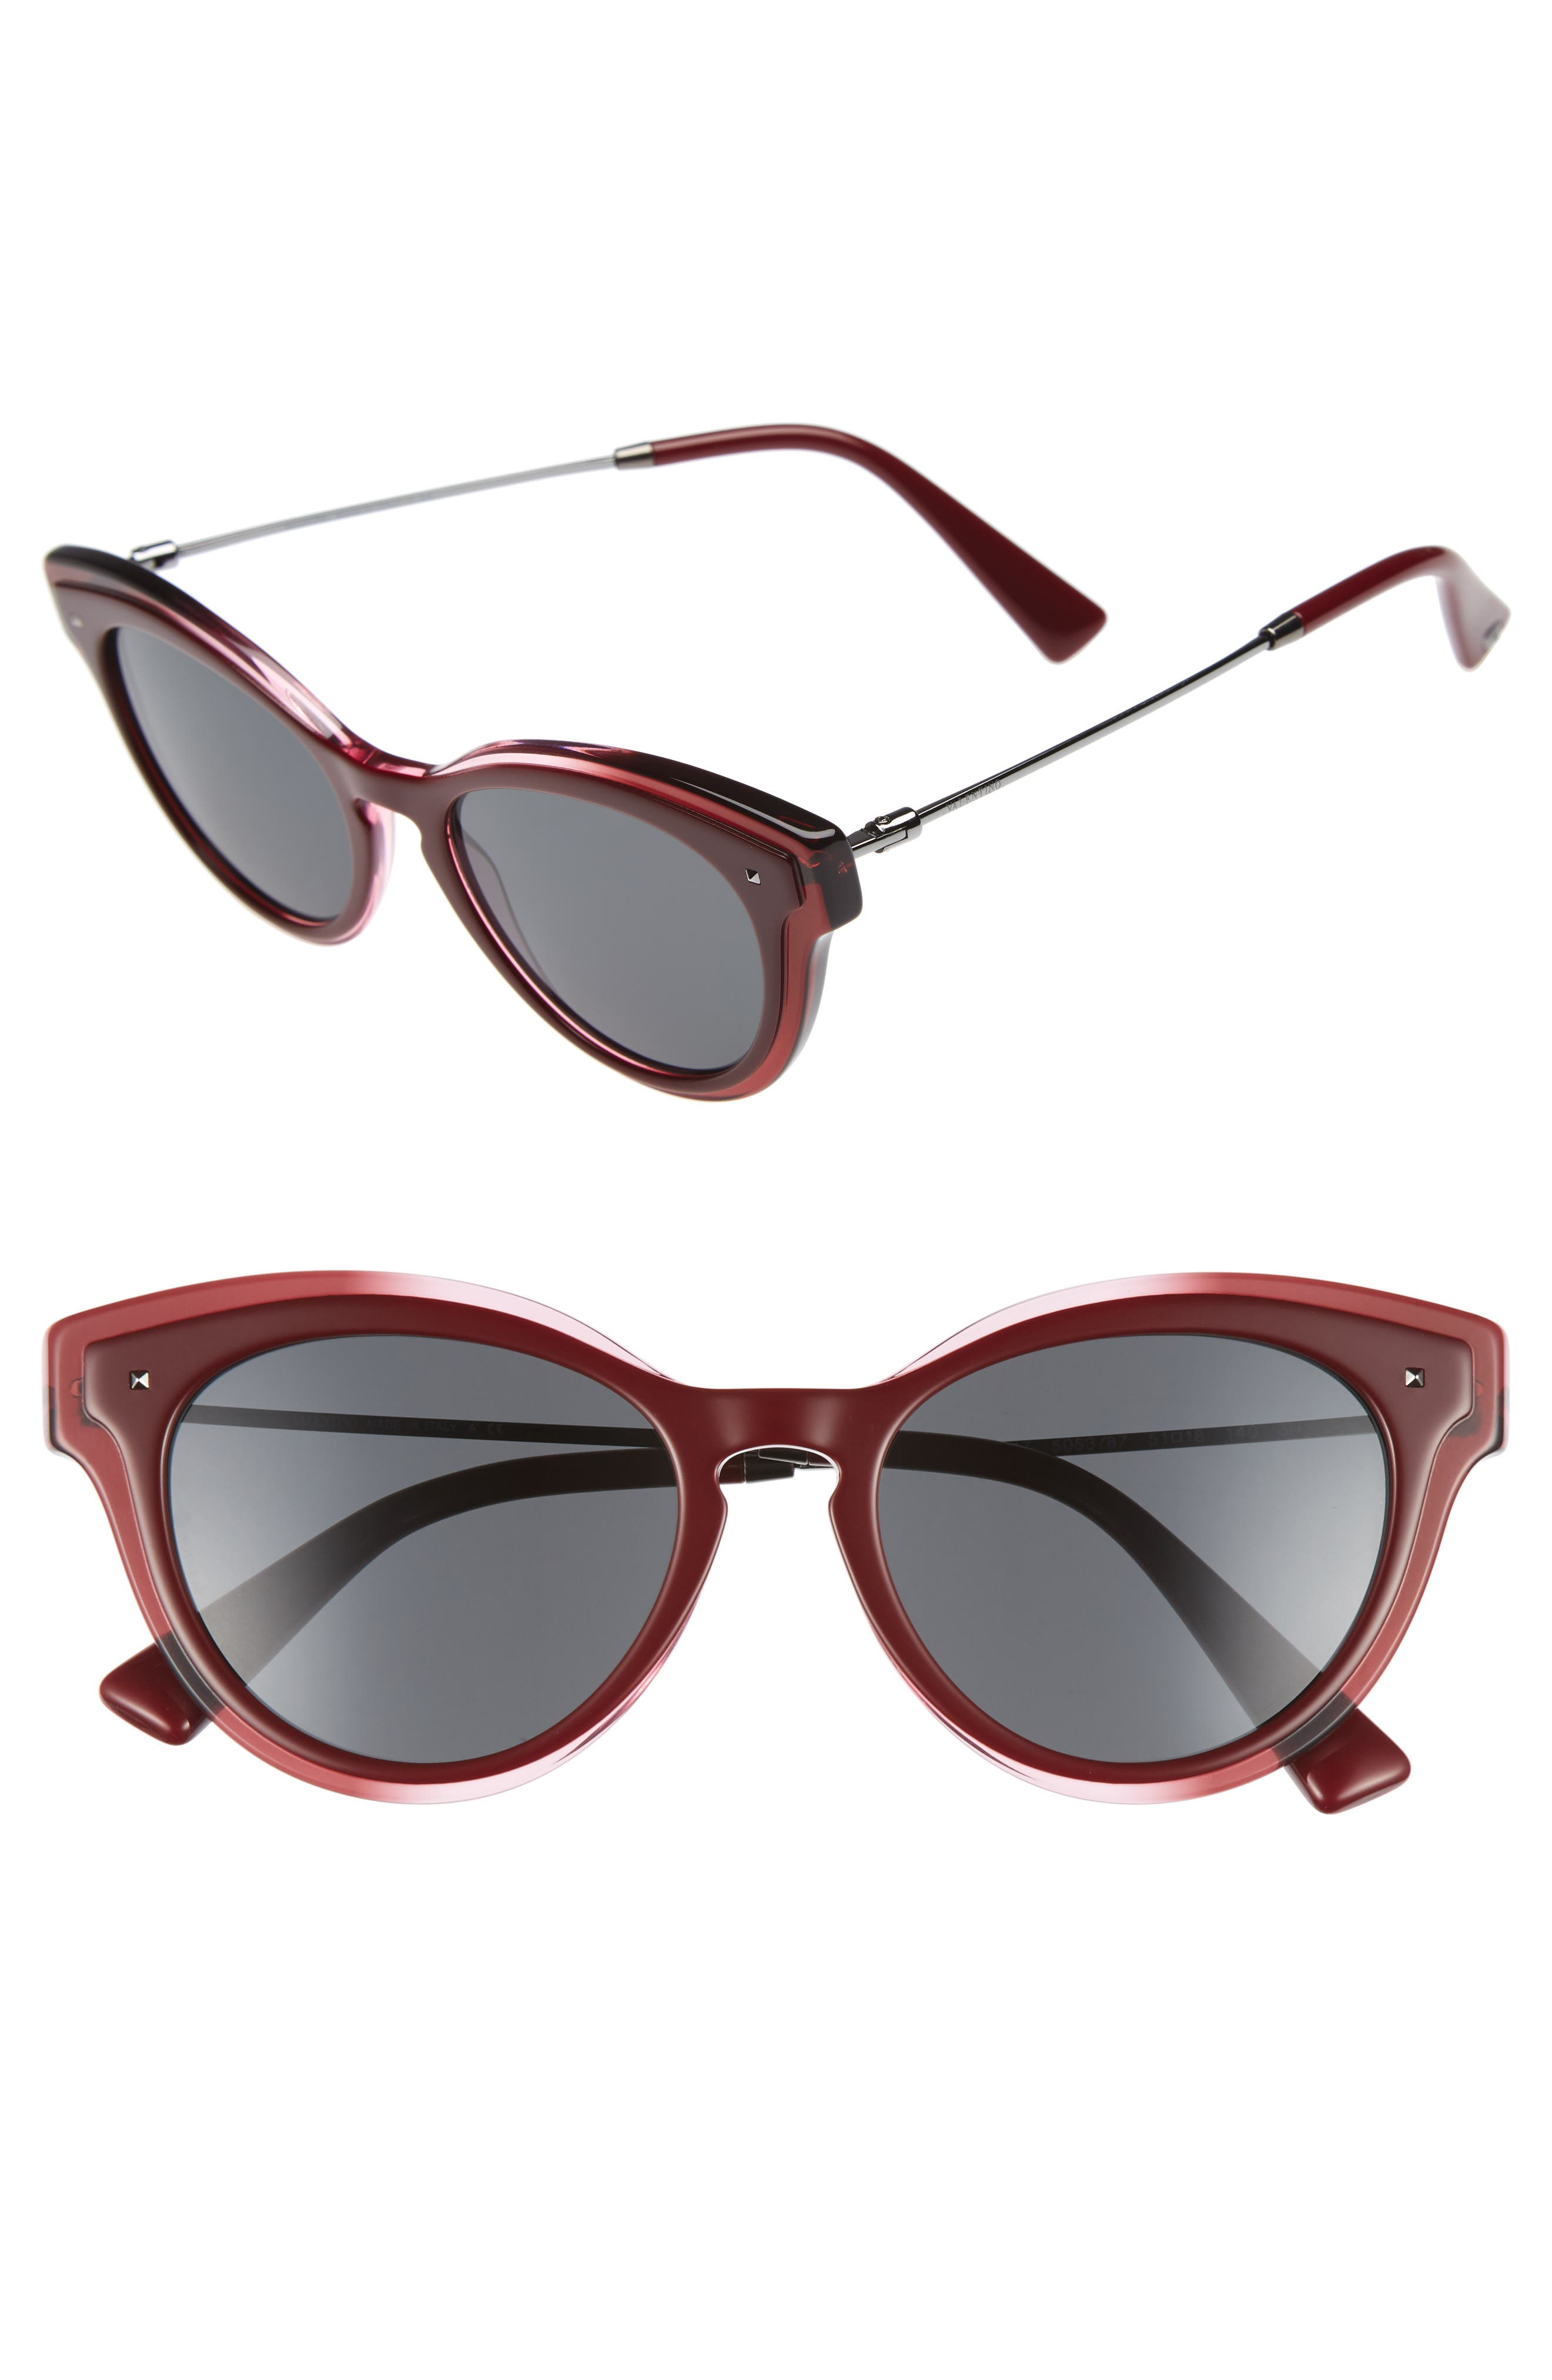 51mm Cat Eye Sunglasses,                             Main thumbnail 1, color,                             600